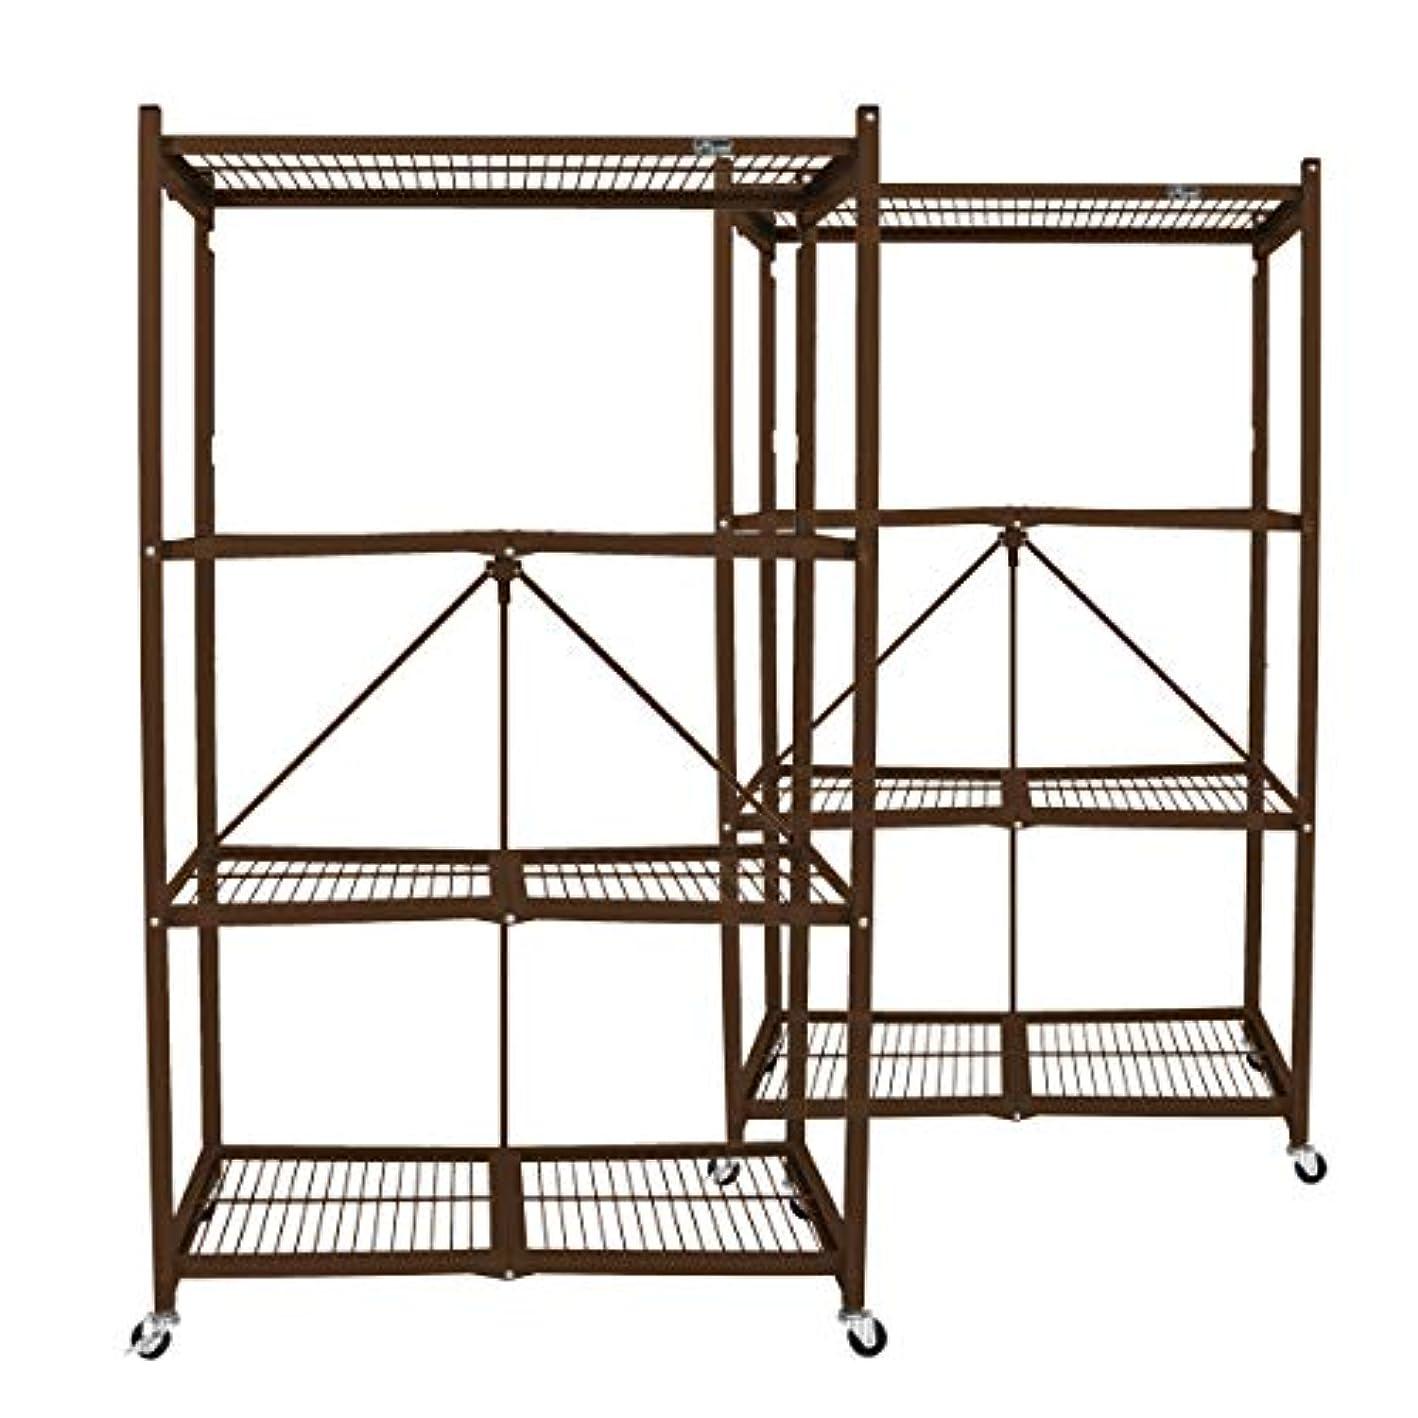 Origami R5VBW2 Wheeled 4 Shelf Folding Steel Wire Shelving Units, Bronze, Pair